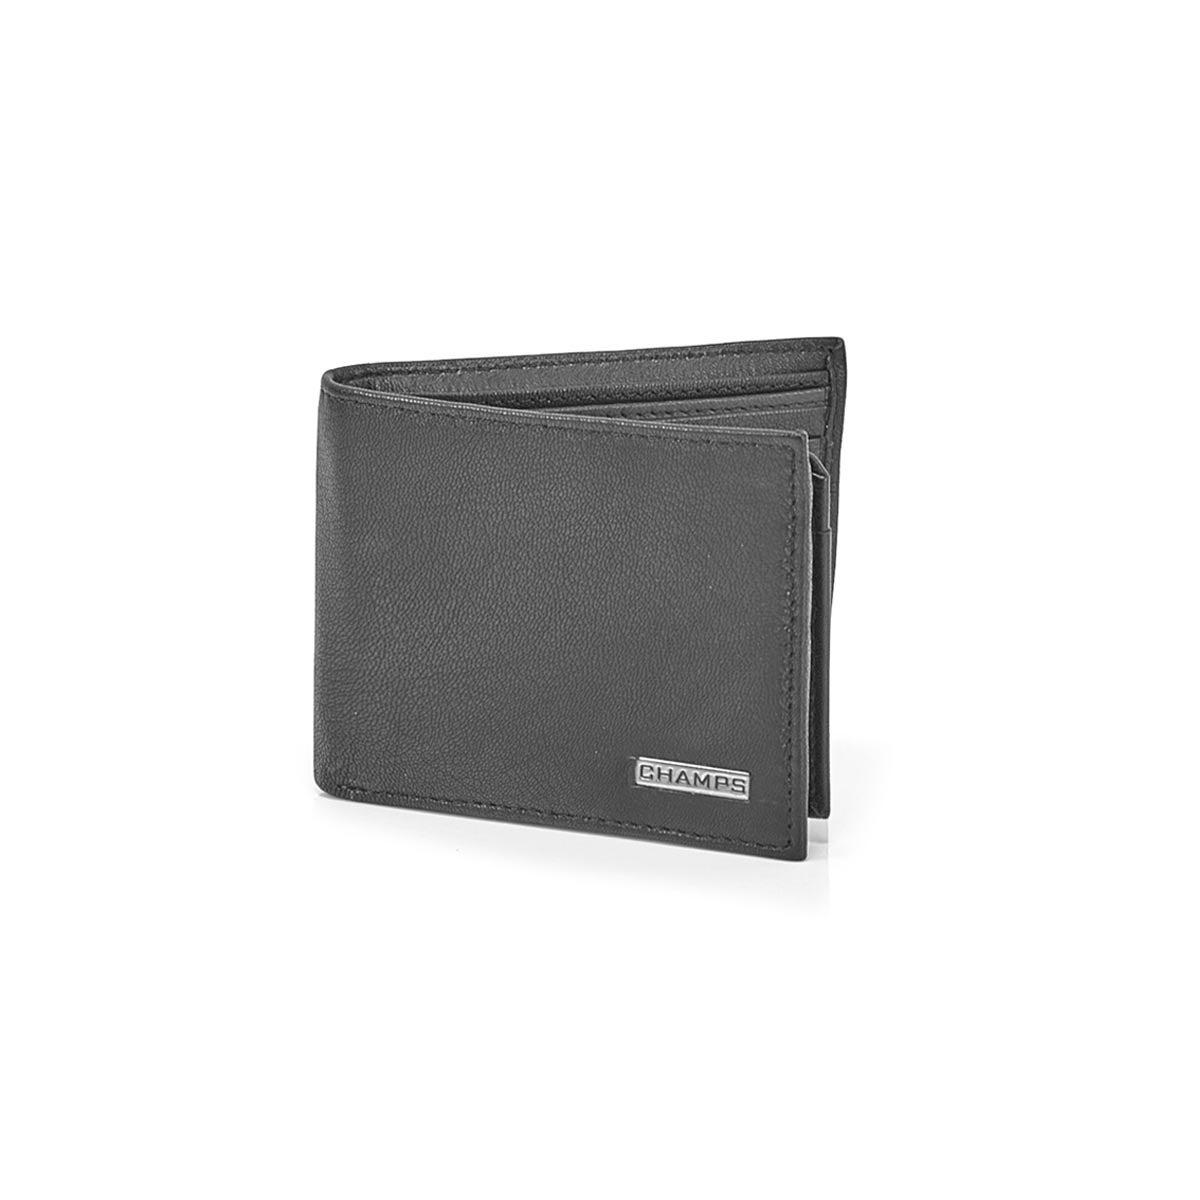 Men's MW-802-BLK cowhide leather wallets